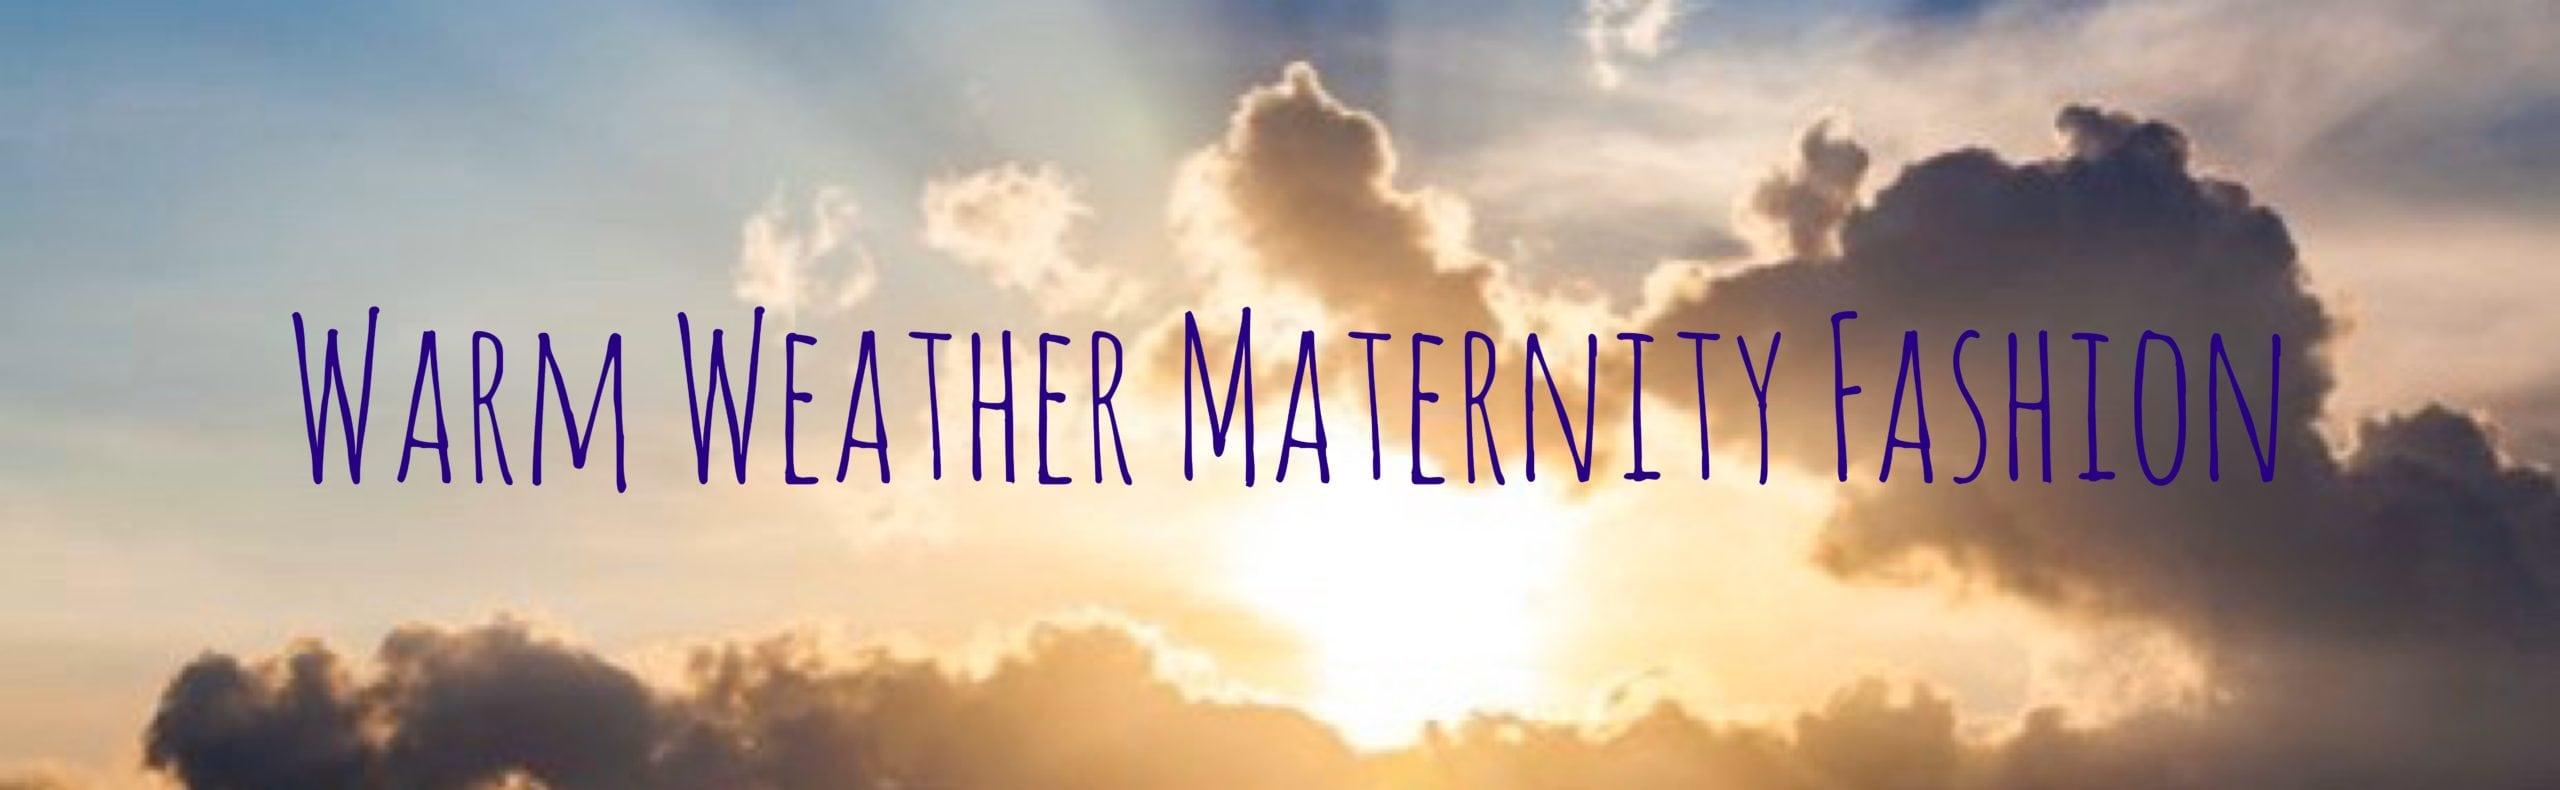 warm weather maternity fashion